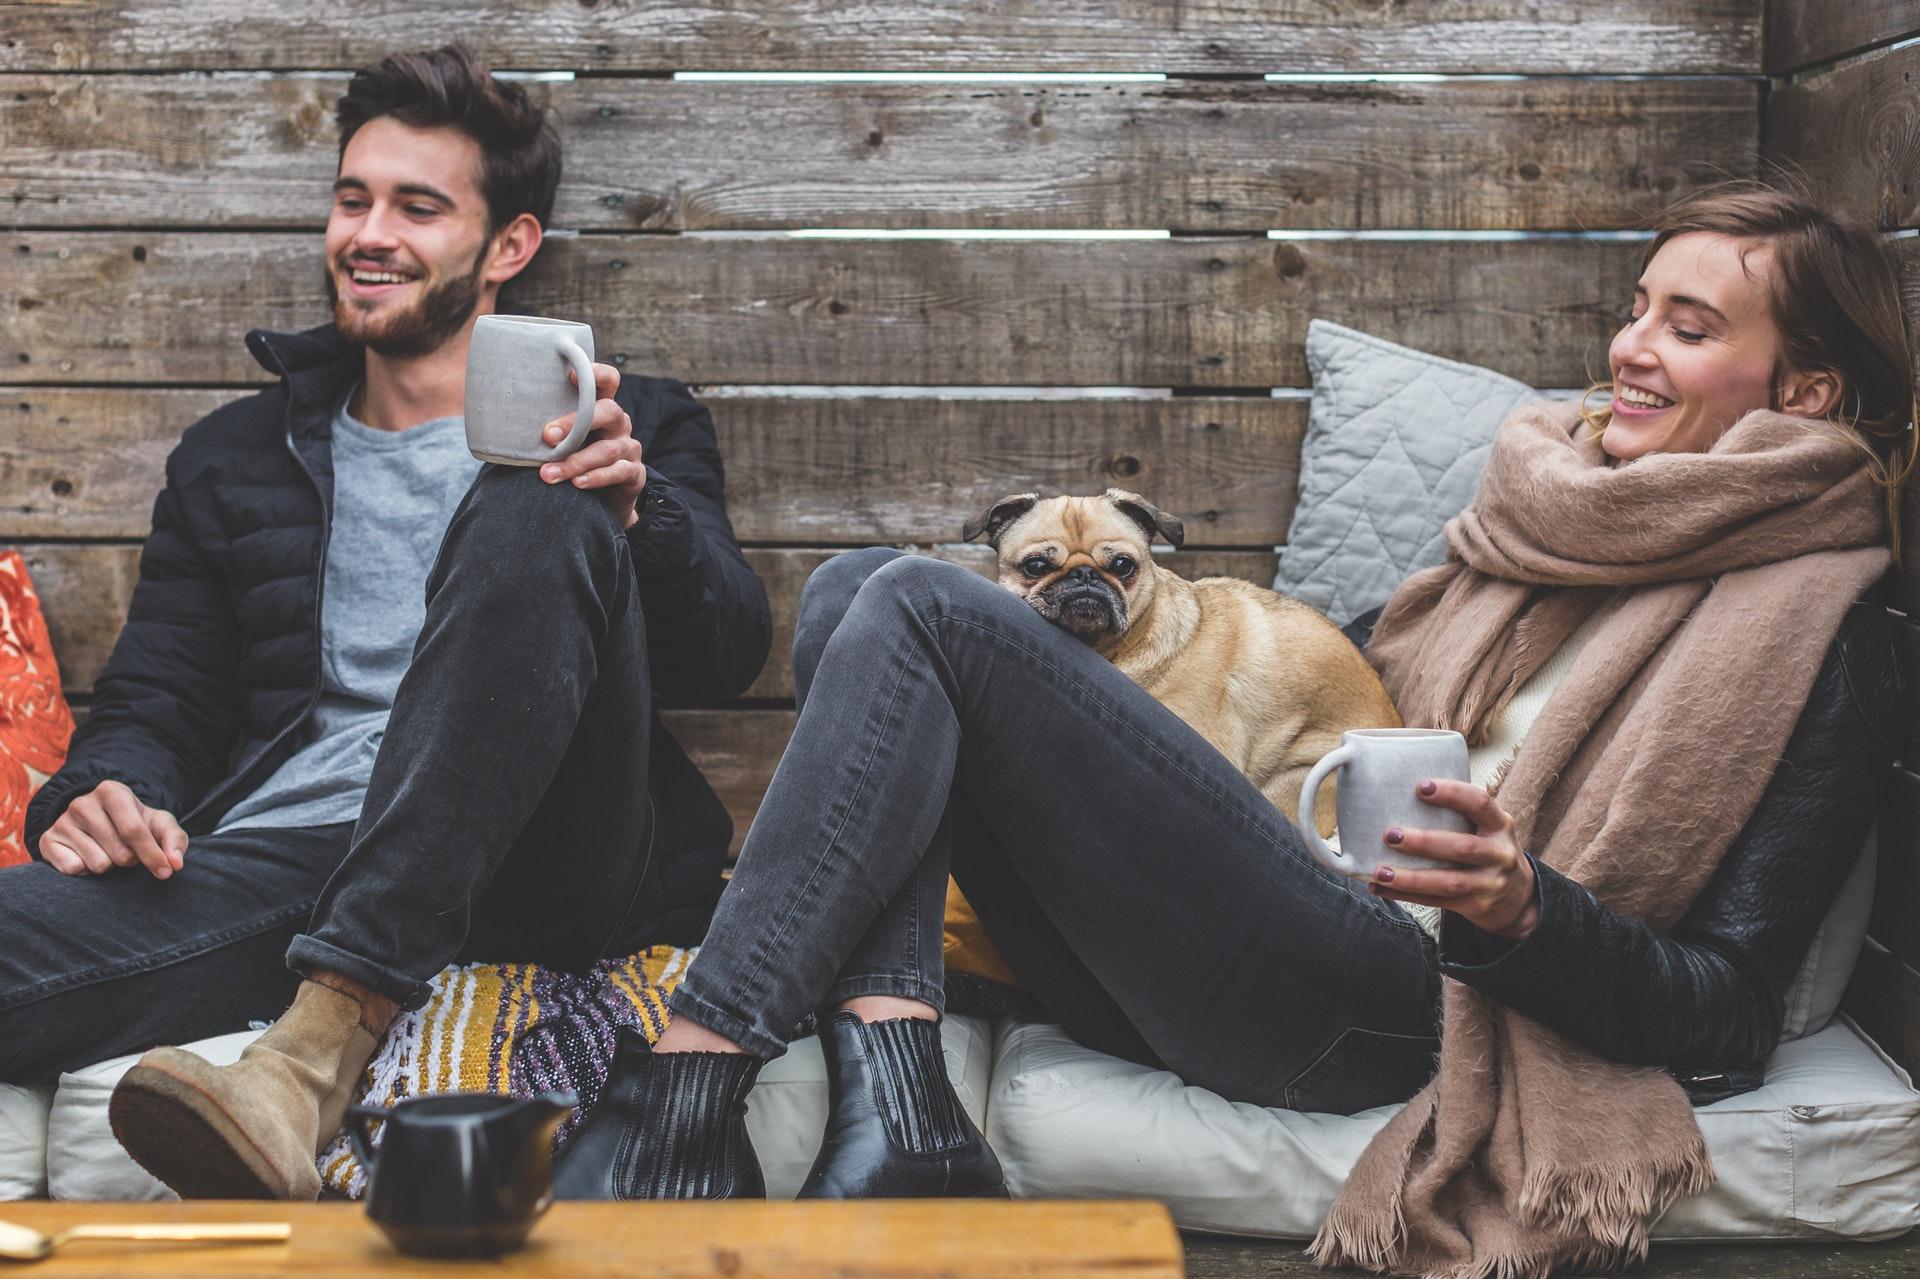 hygge-wellness-benefits-togetherness